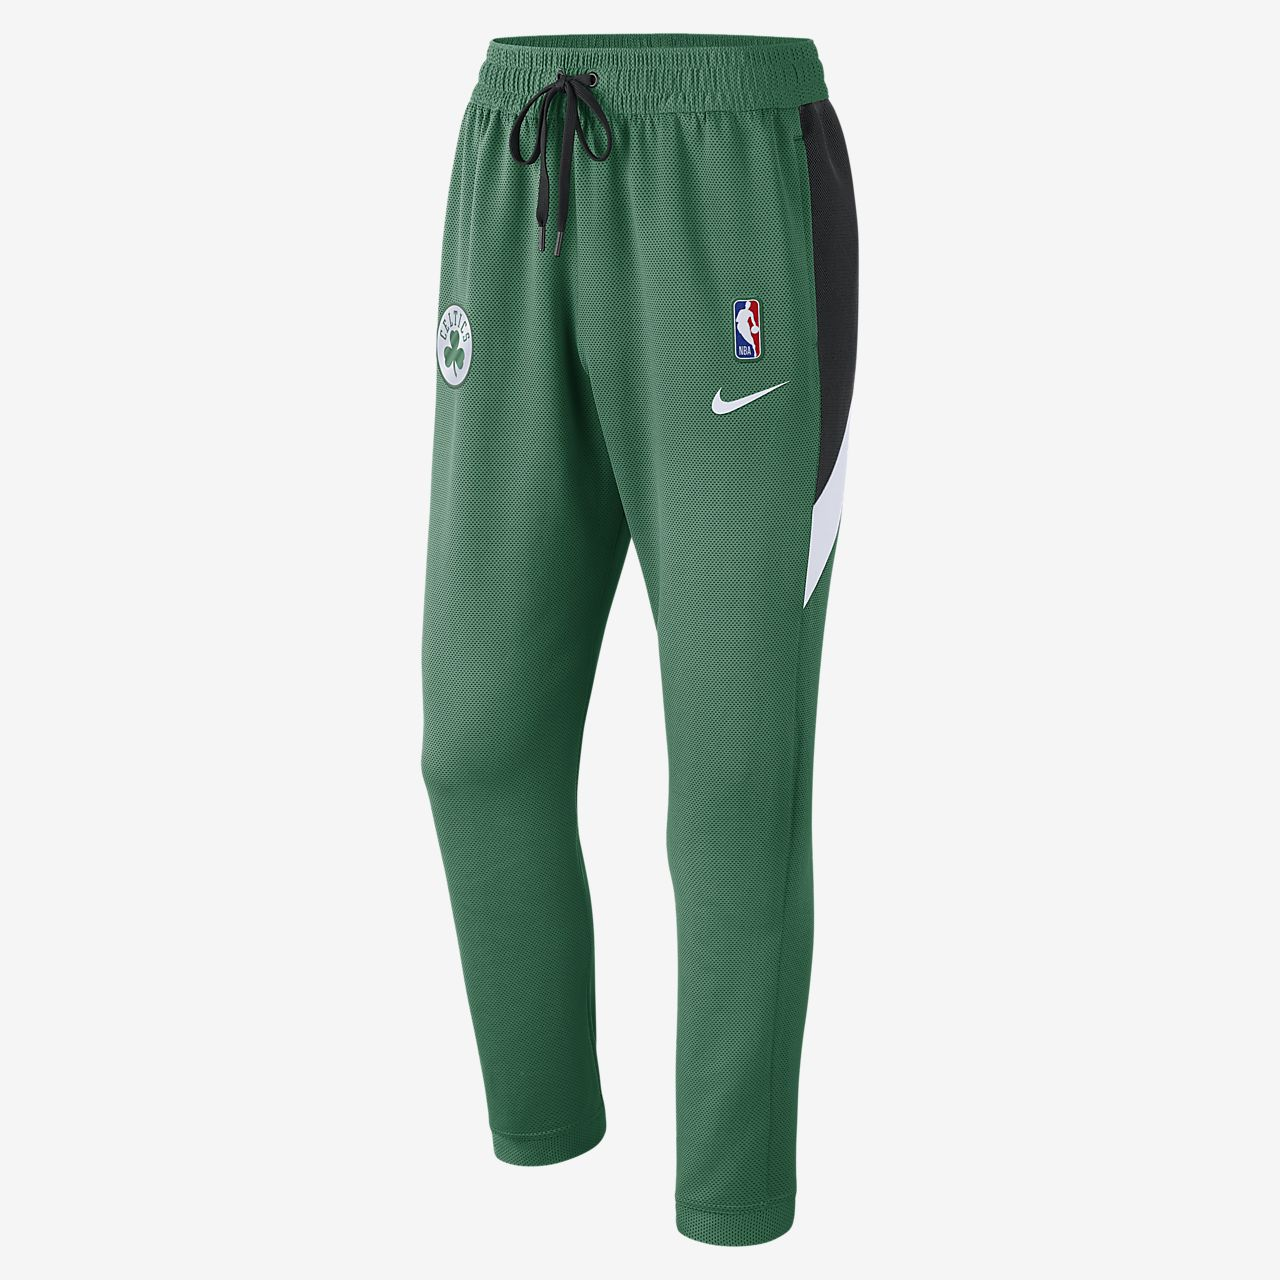 Pantalon NBA Boston Celtics Nike Therma Flex Showtime pour Homme